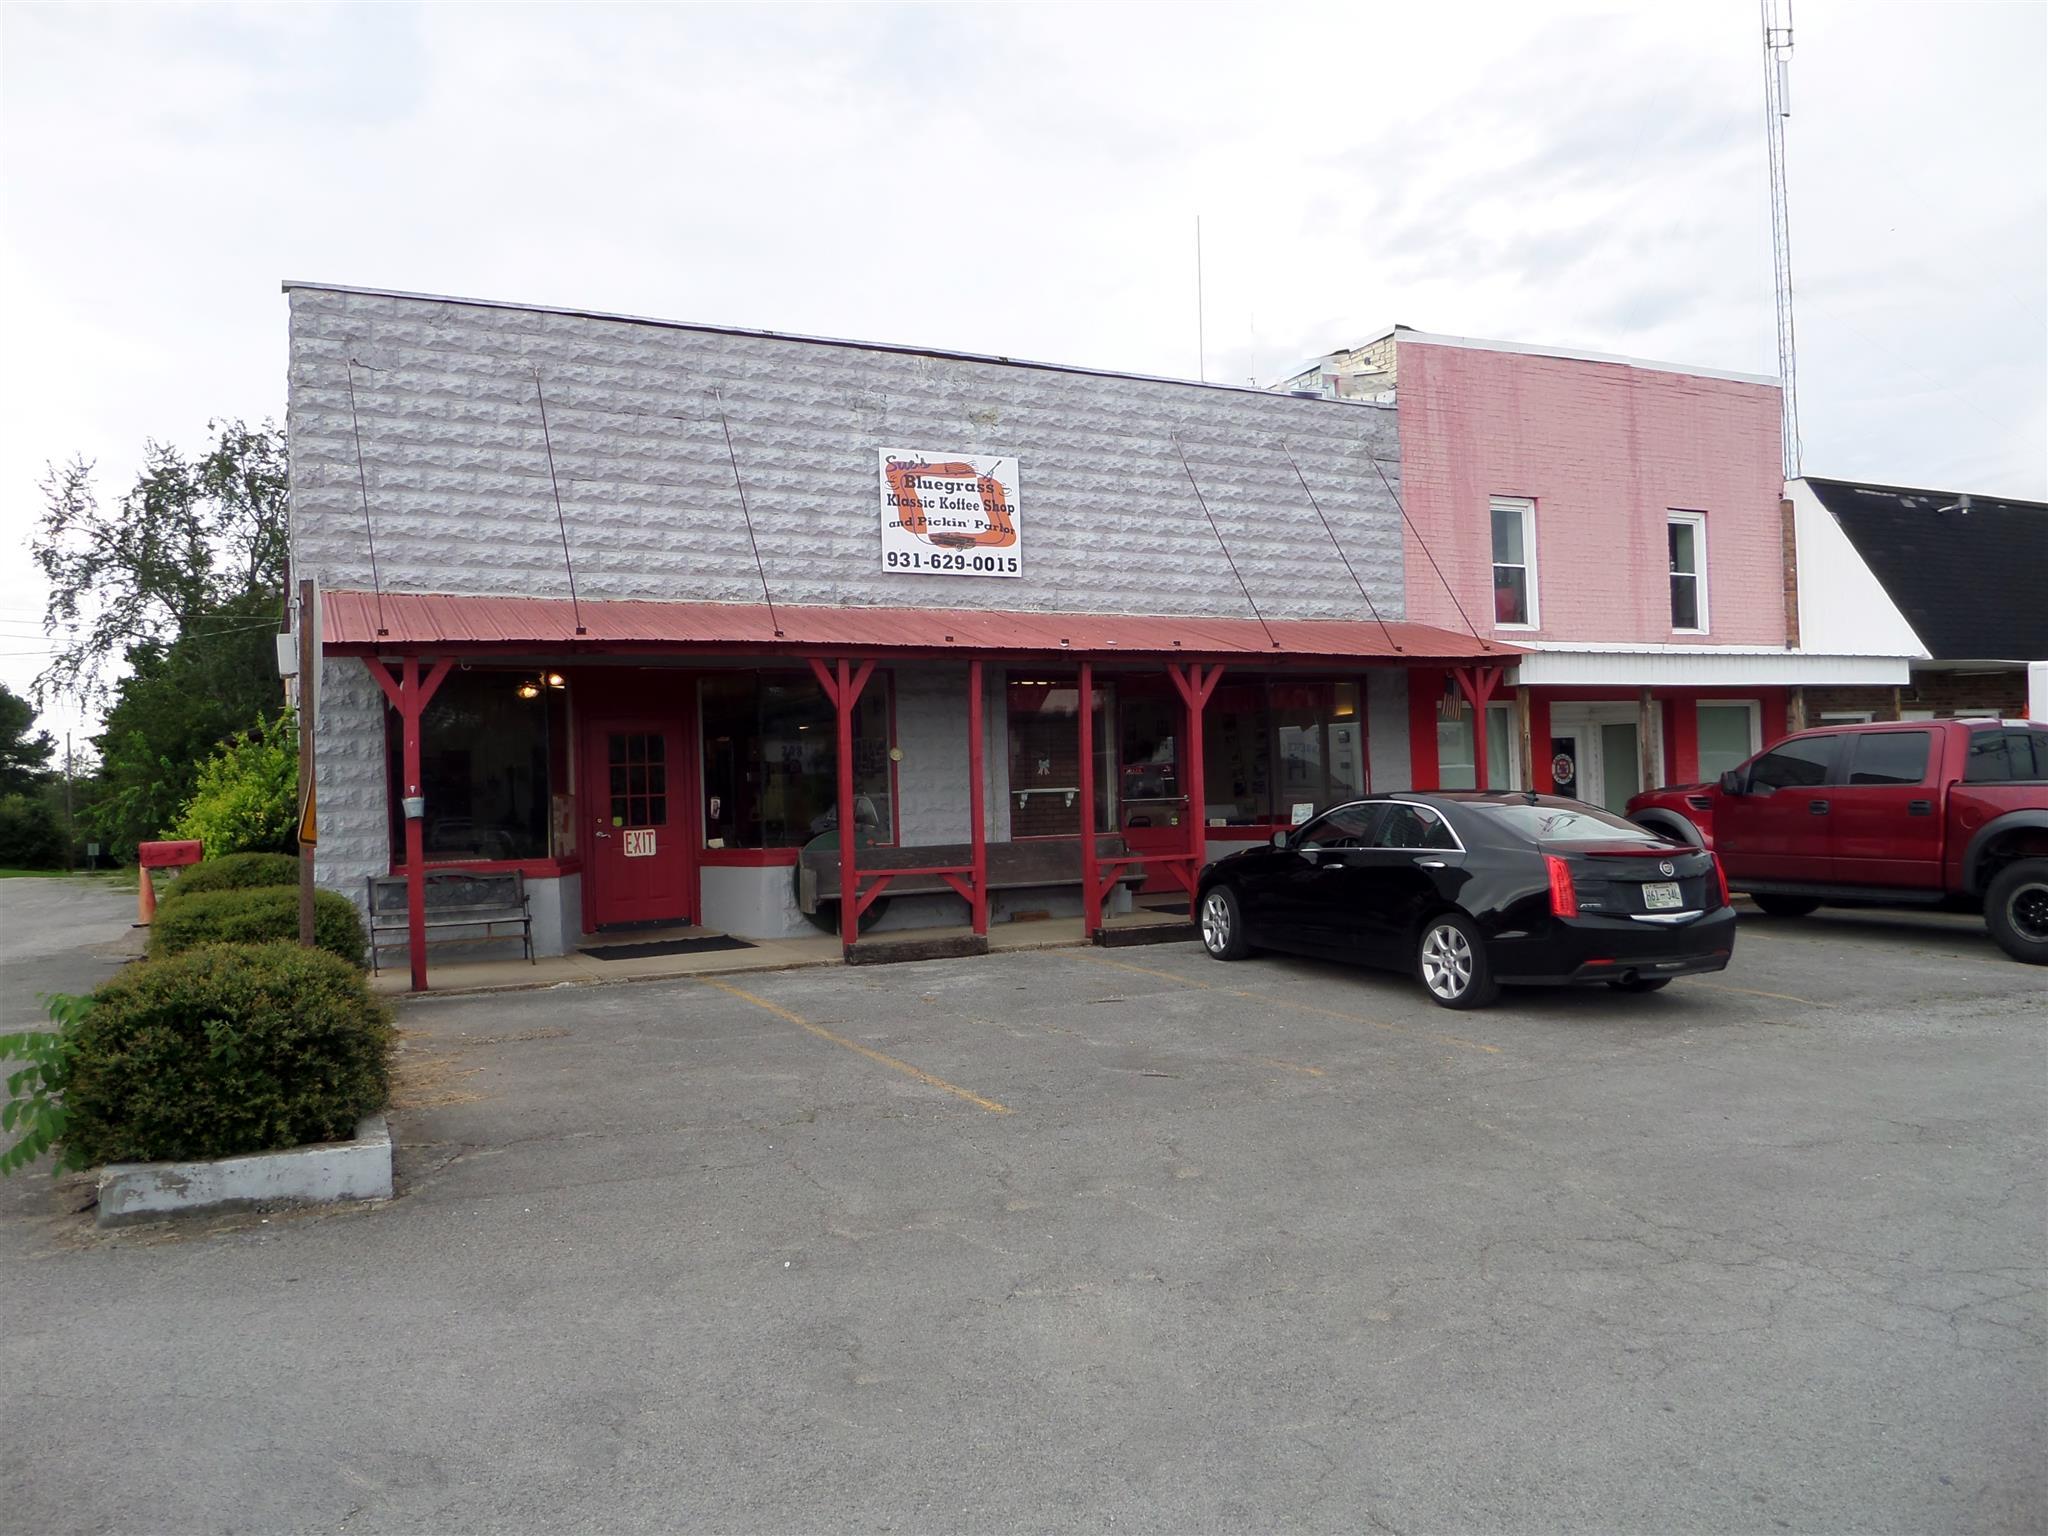 208 Depot St, Ethridge, TN 38456